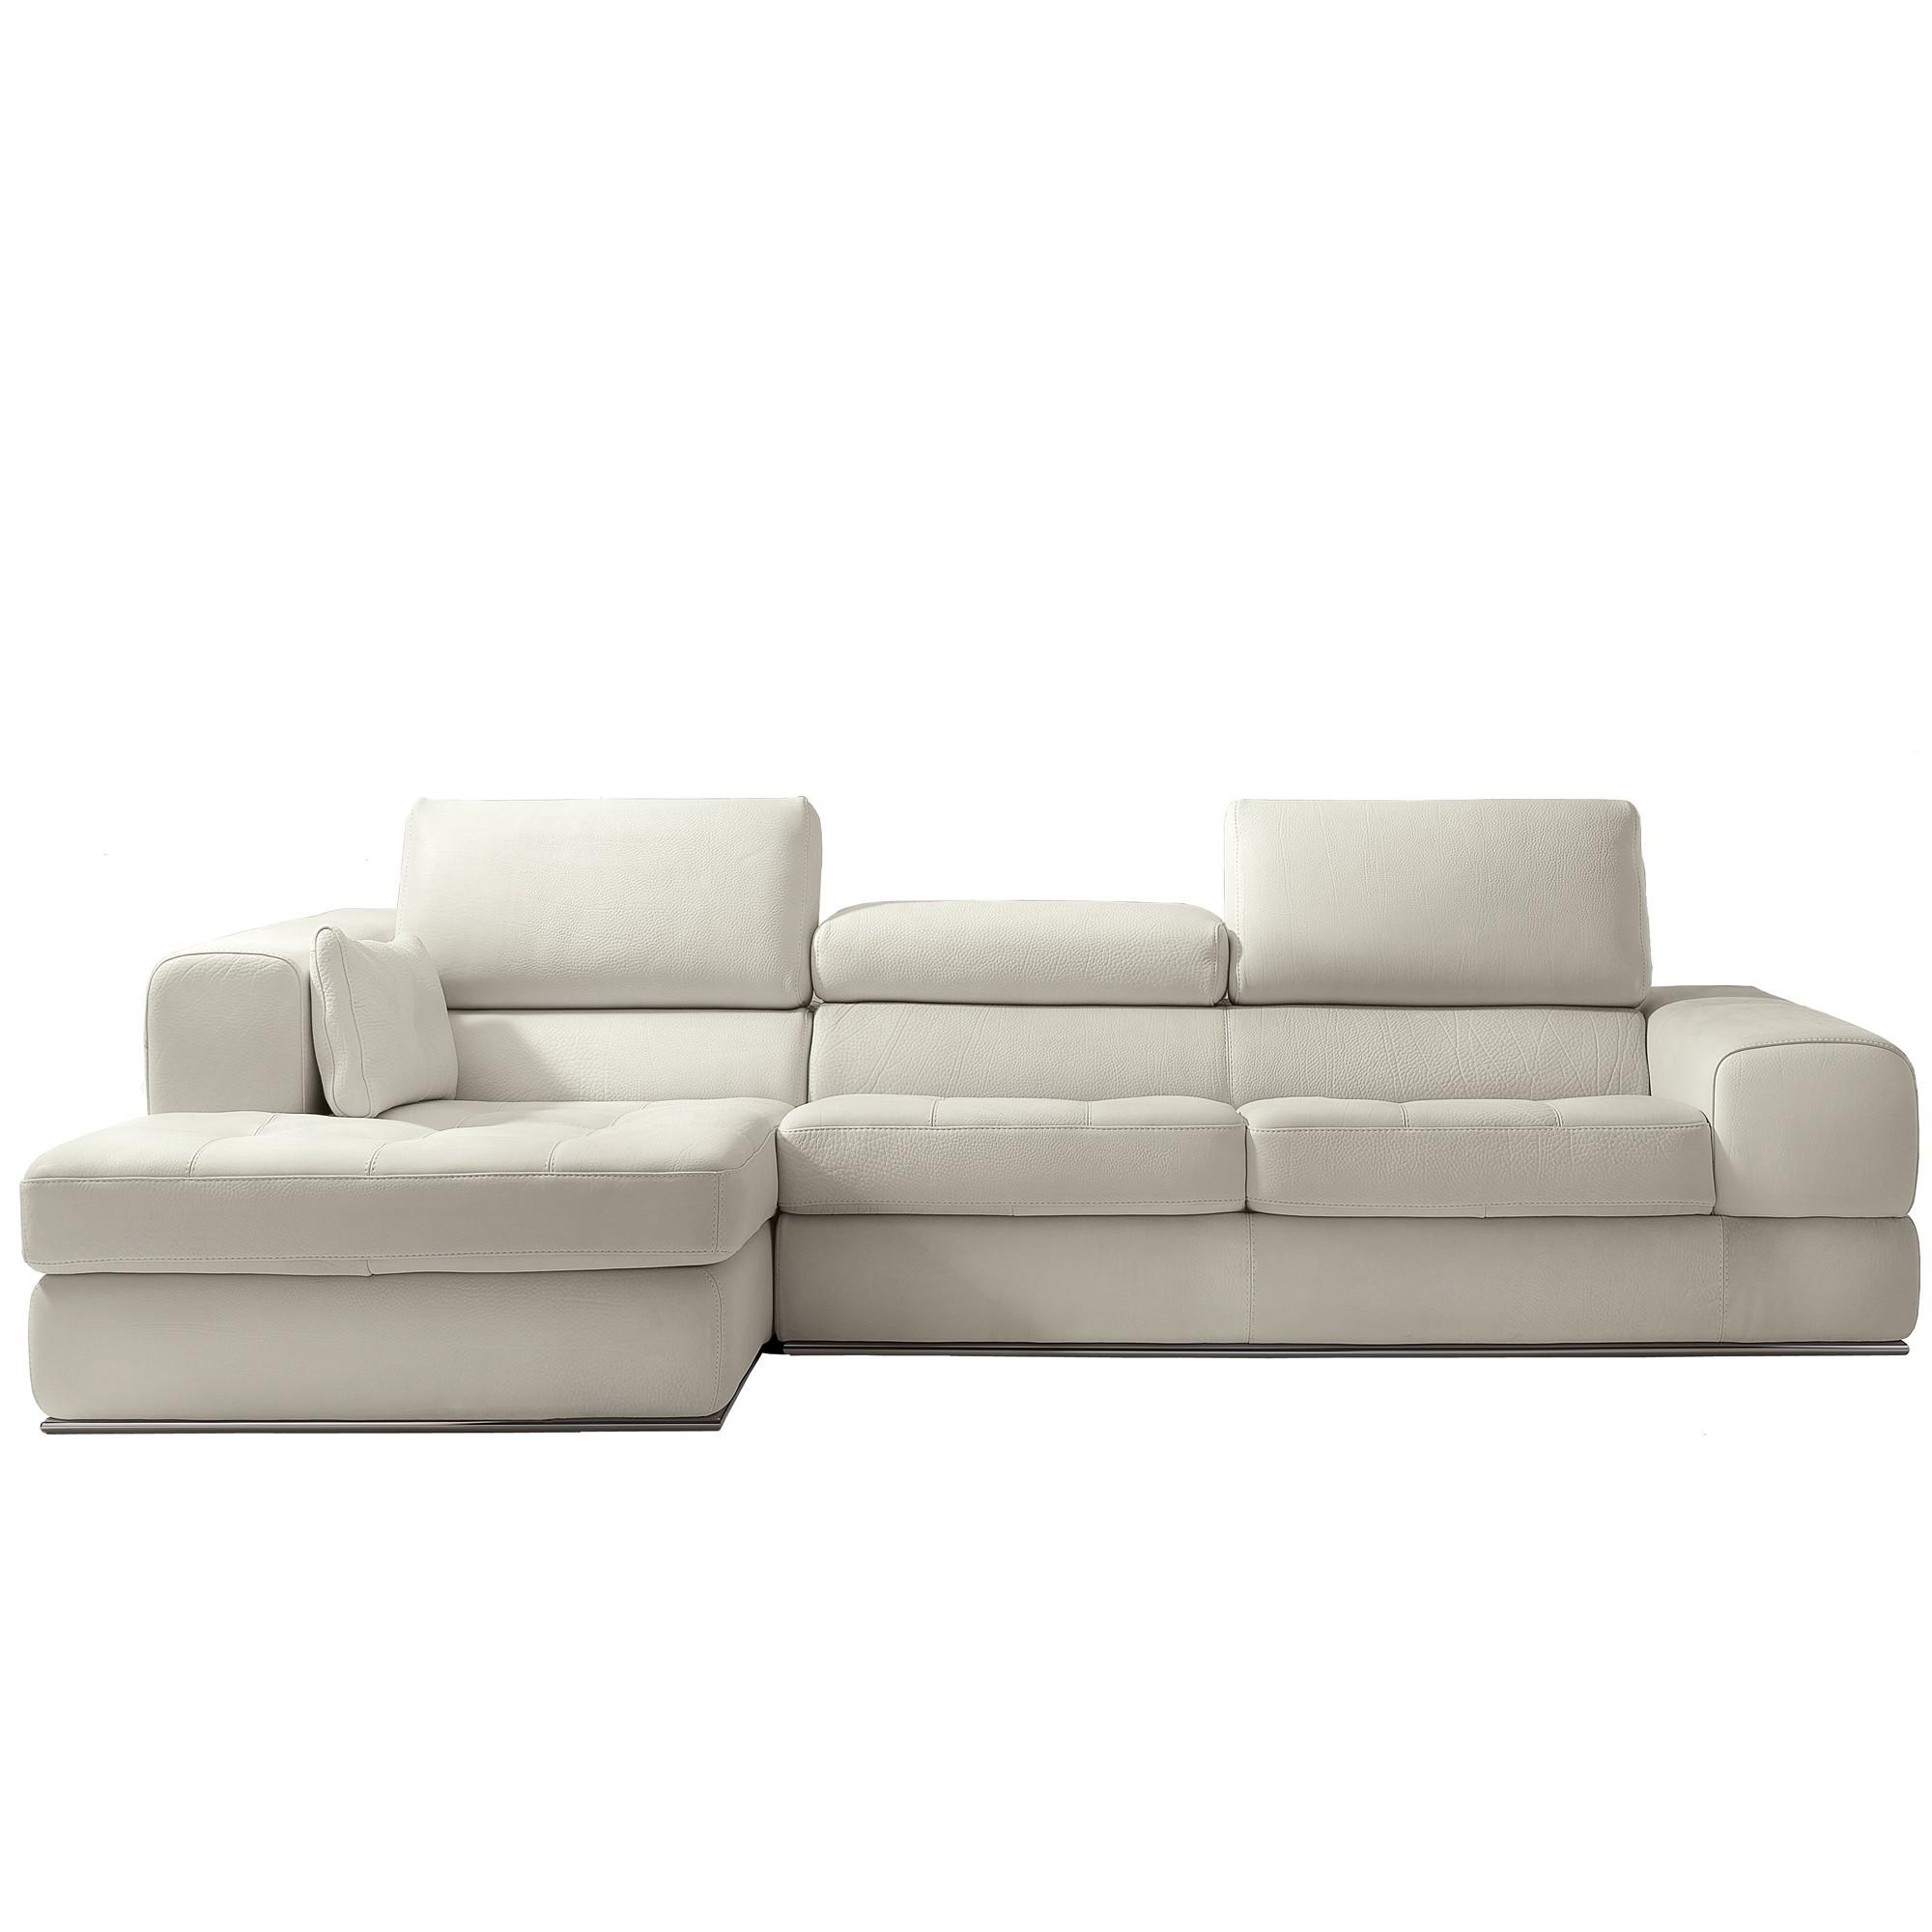 max divani modular sofa lhf max divani cookes furniture